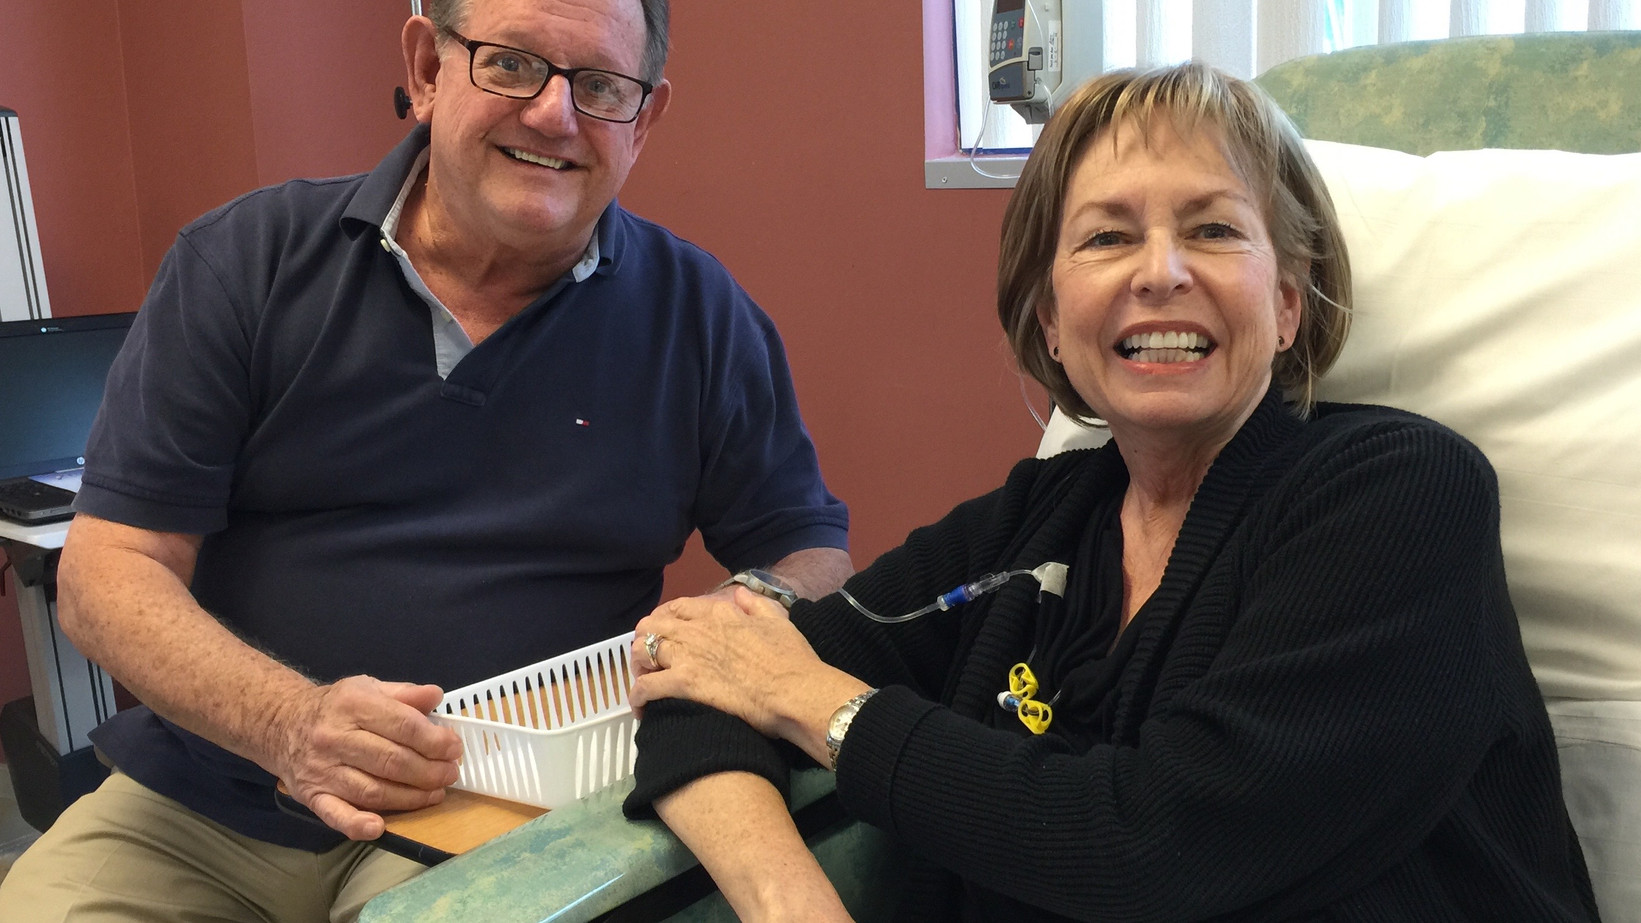 Bonus Content: Jason (Mo's Son) surprise mo in Florida during her last chemo session...